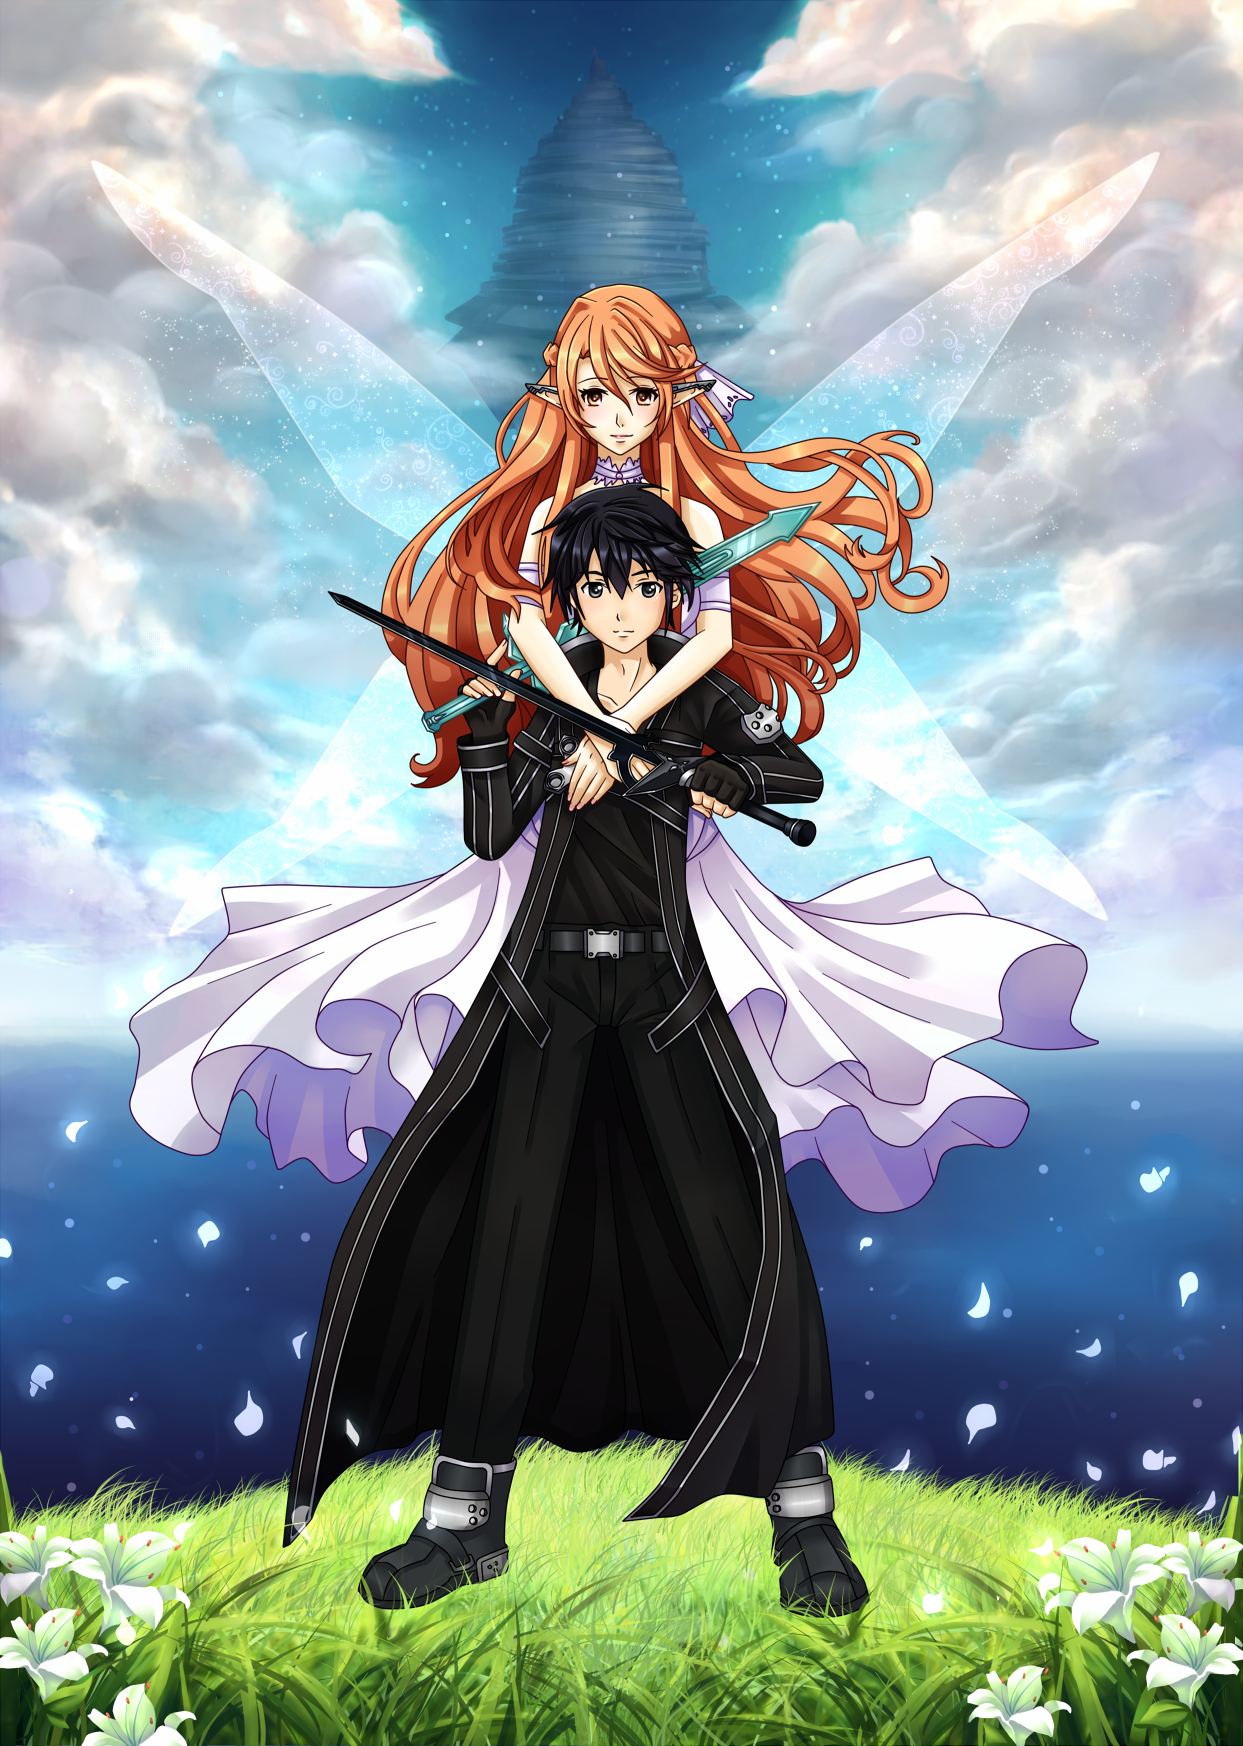 Sao Kirito And Asuna By Ichigokitten On Deviantart